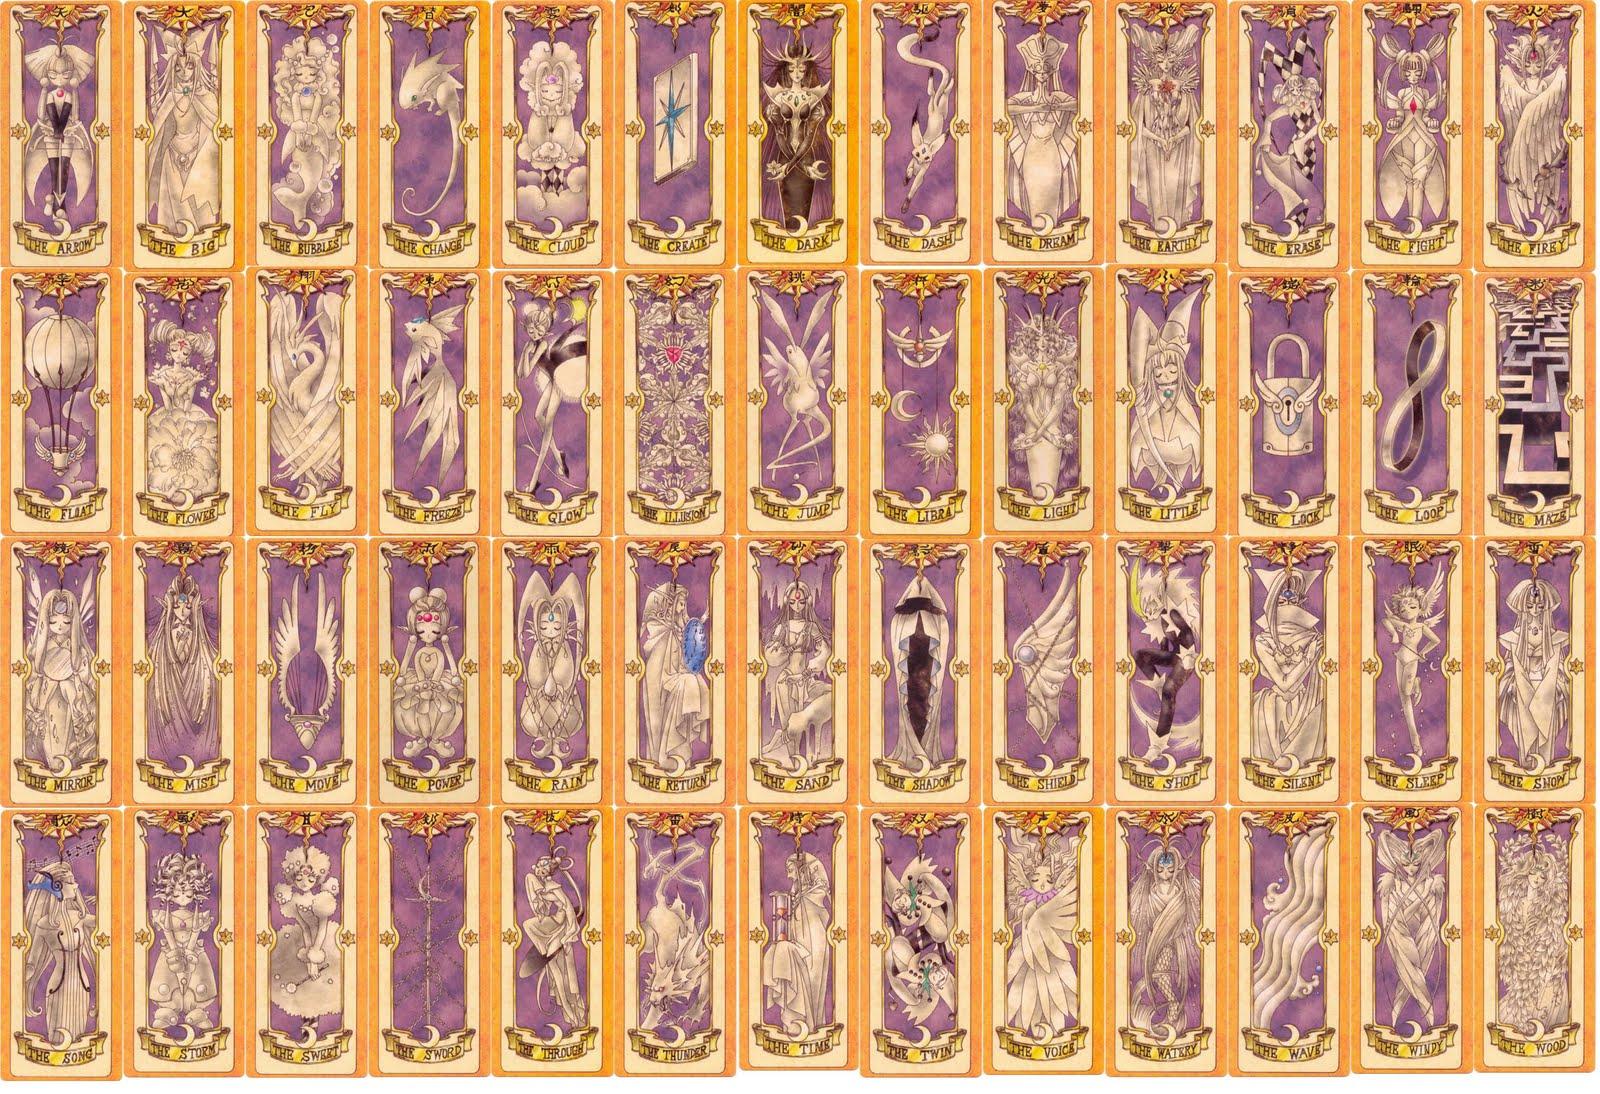 Cardcaptor sakura cards